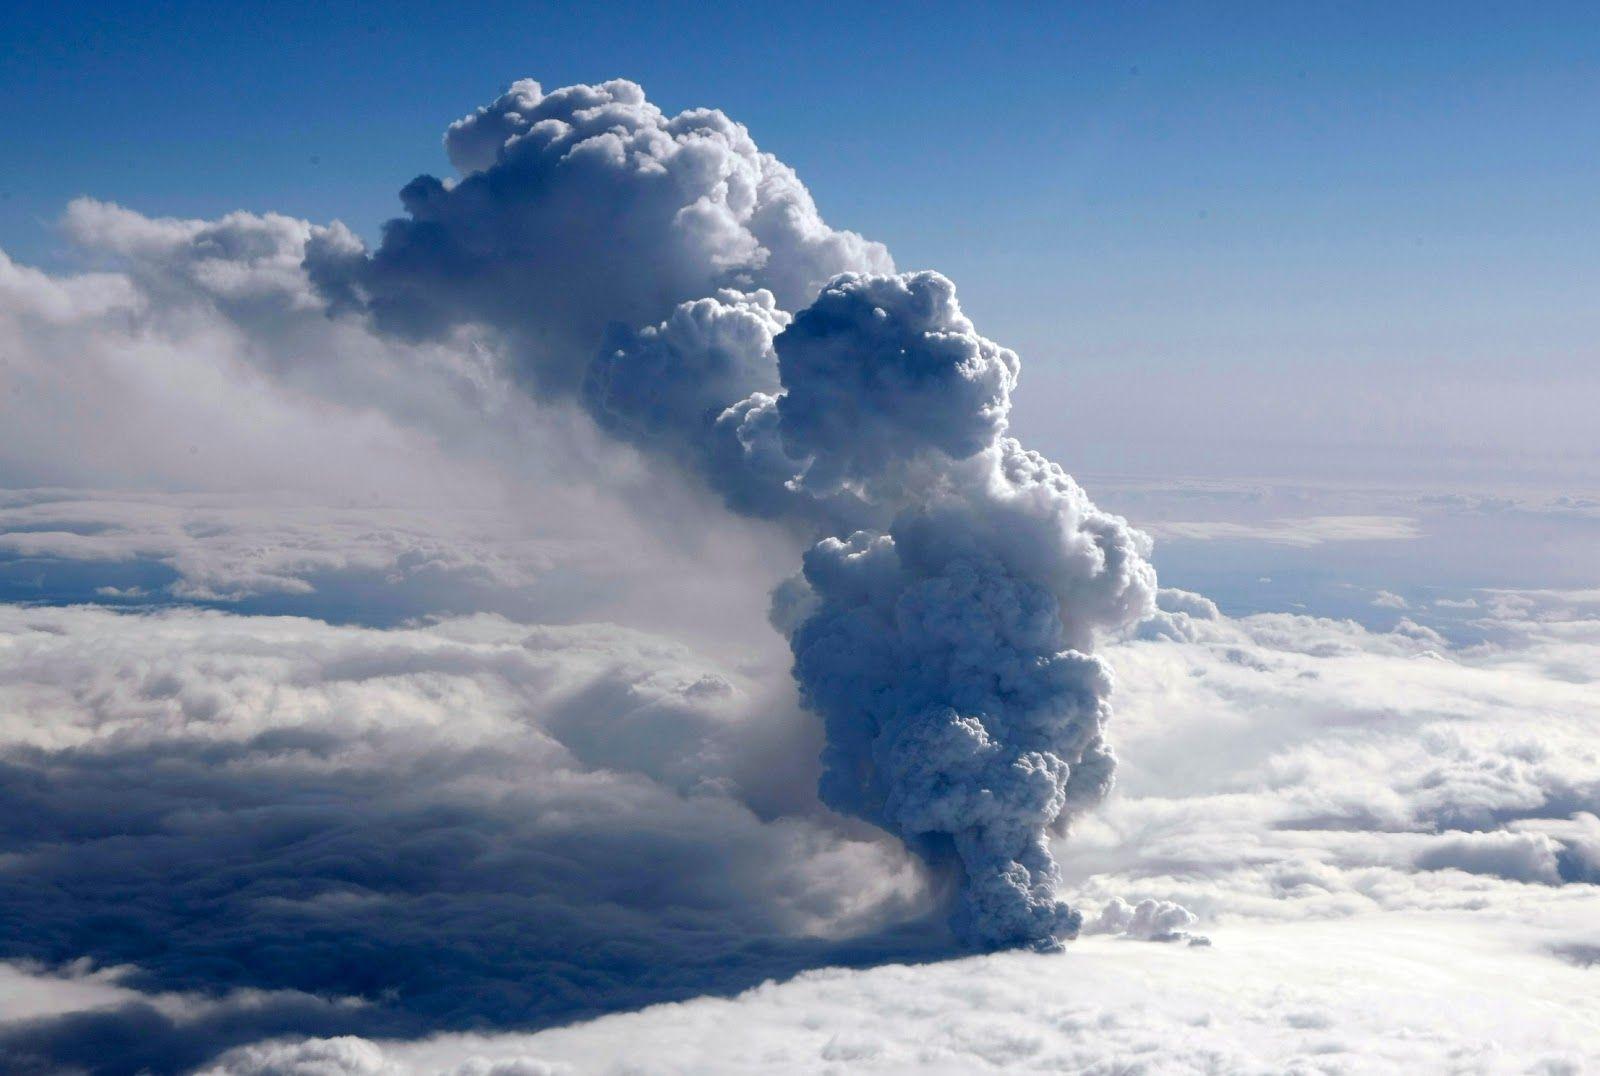 Eyjafjallajökull Volcano Eruption | Super nature | Pinterest ...